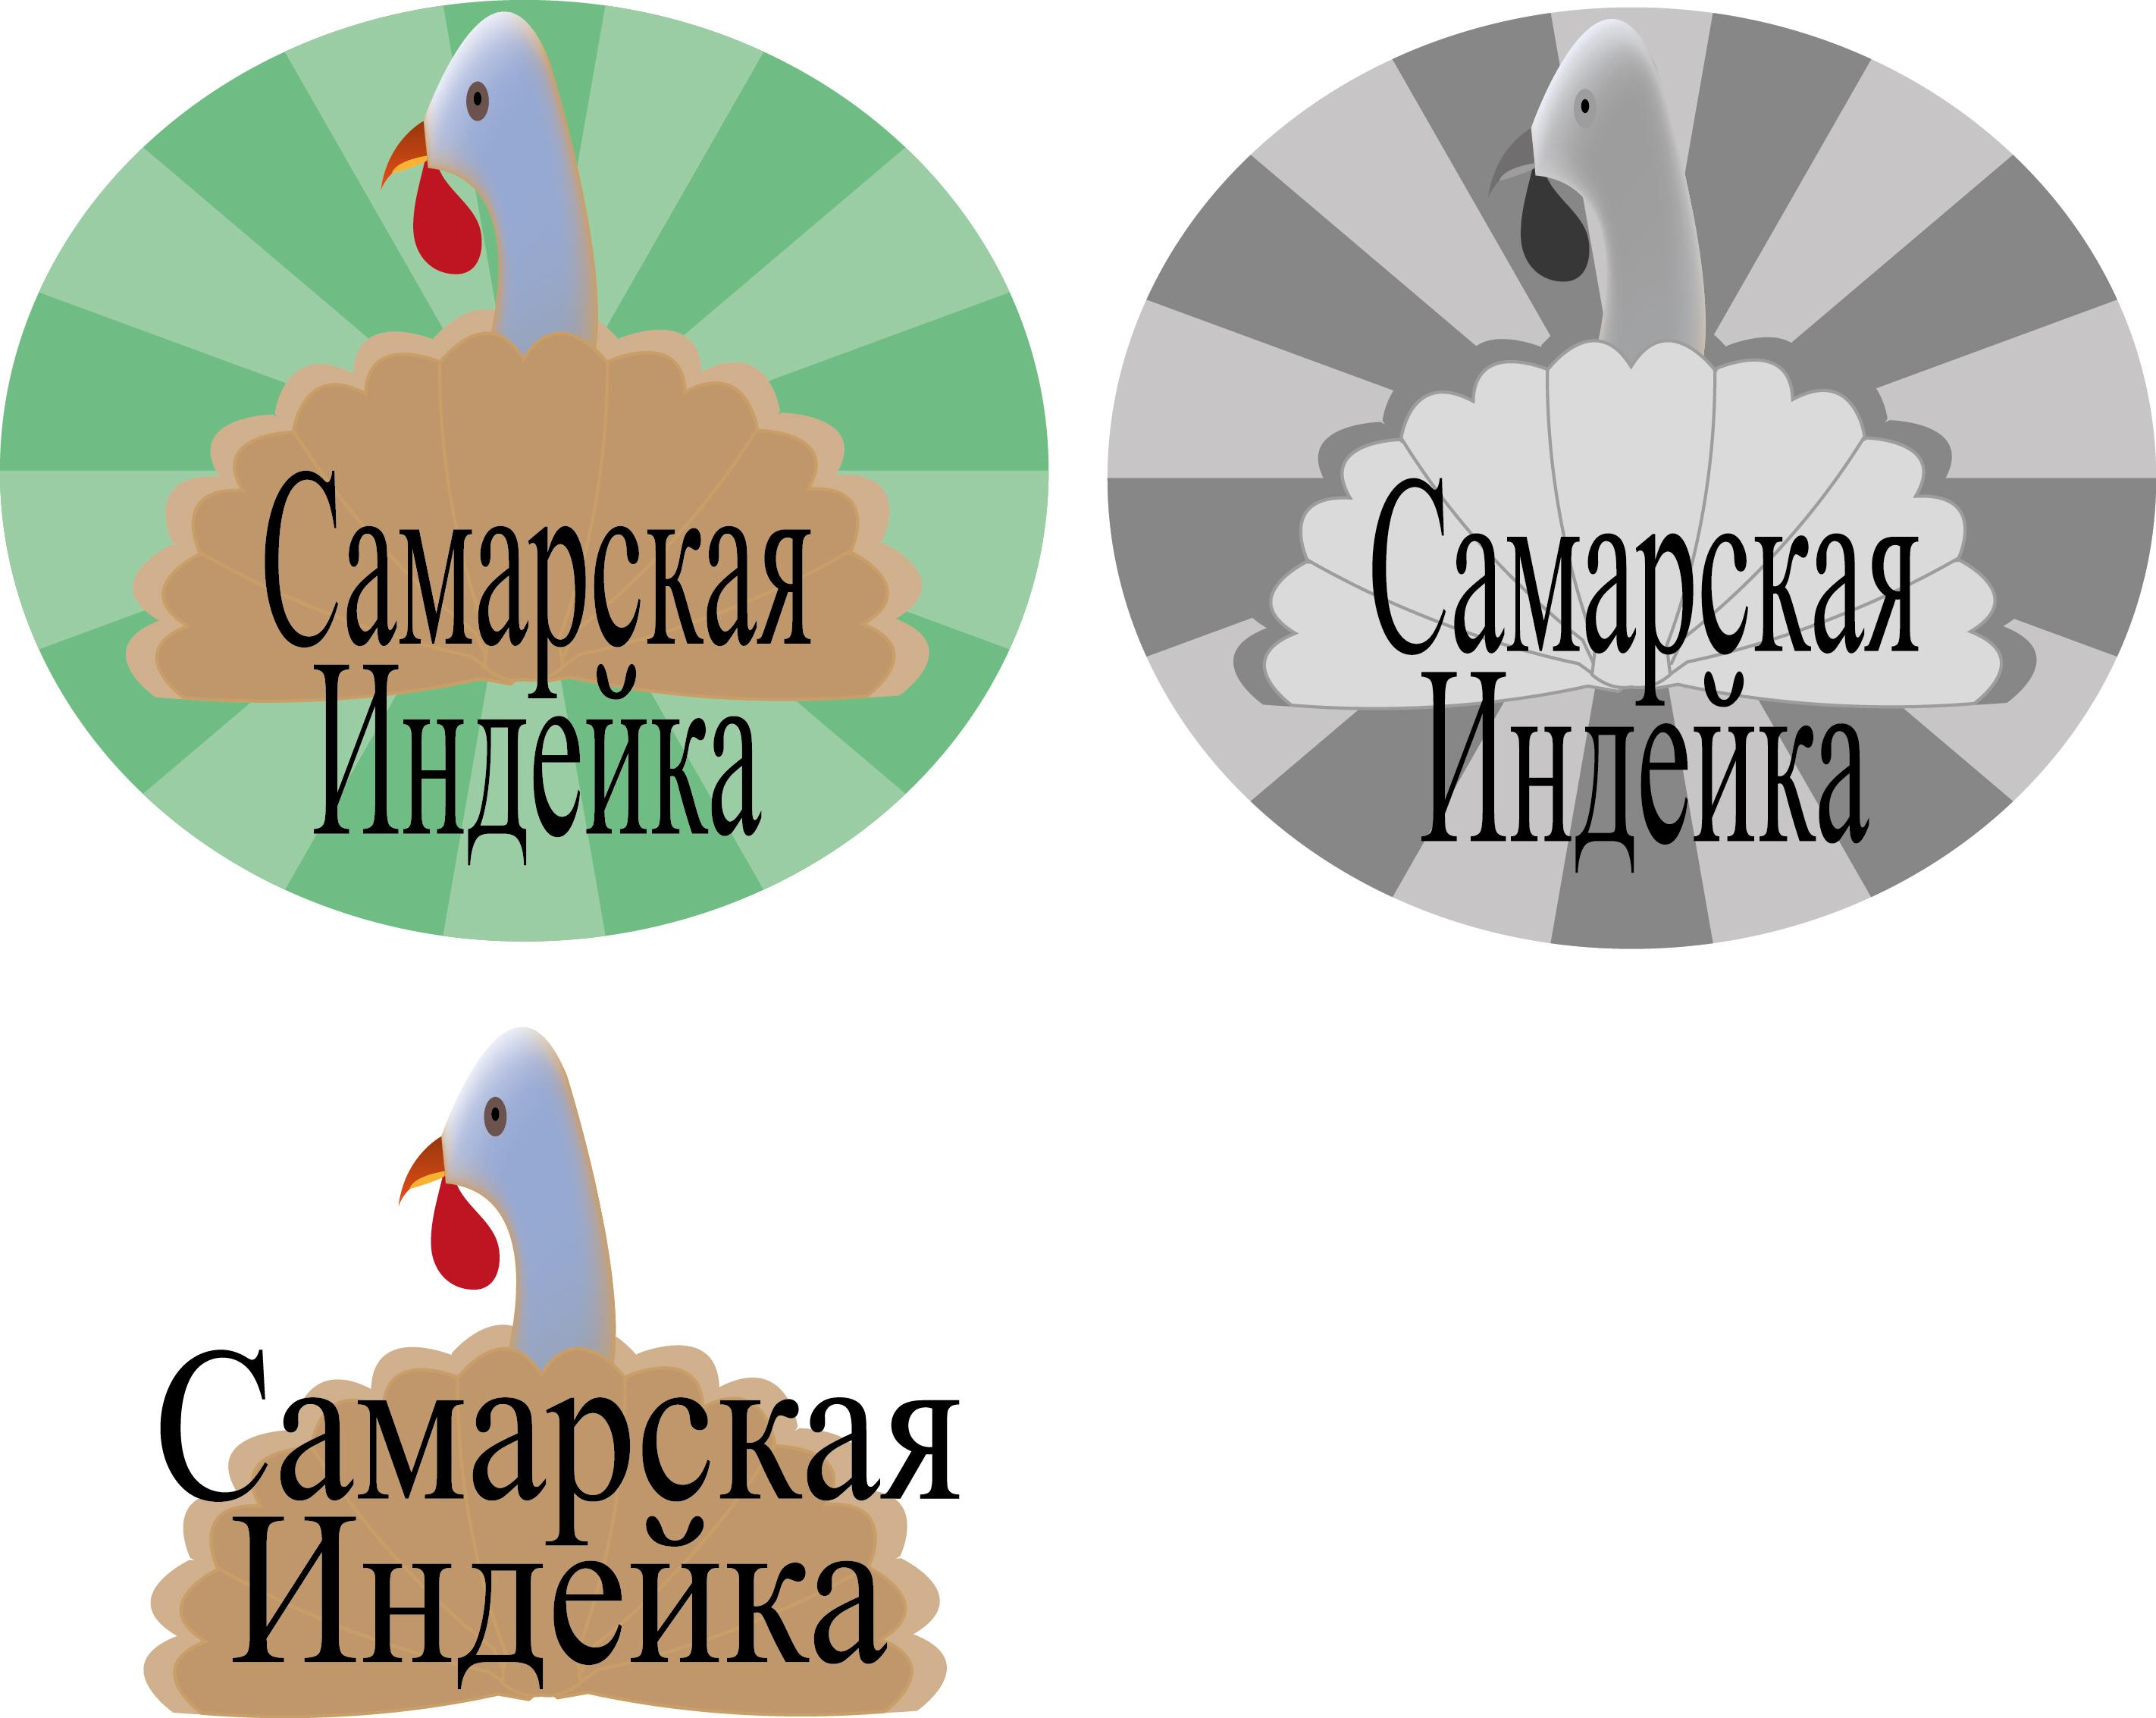 Создание логотипа Сельхоз производителя фото f_73155e19e98887f4.jpg